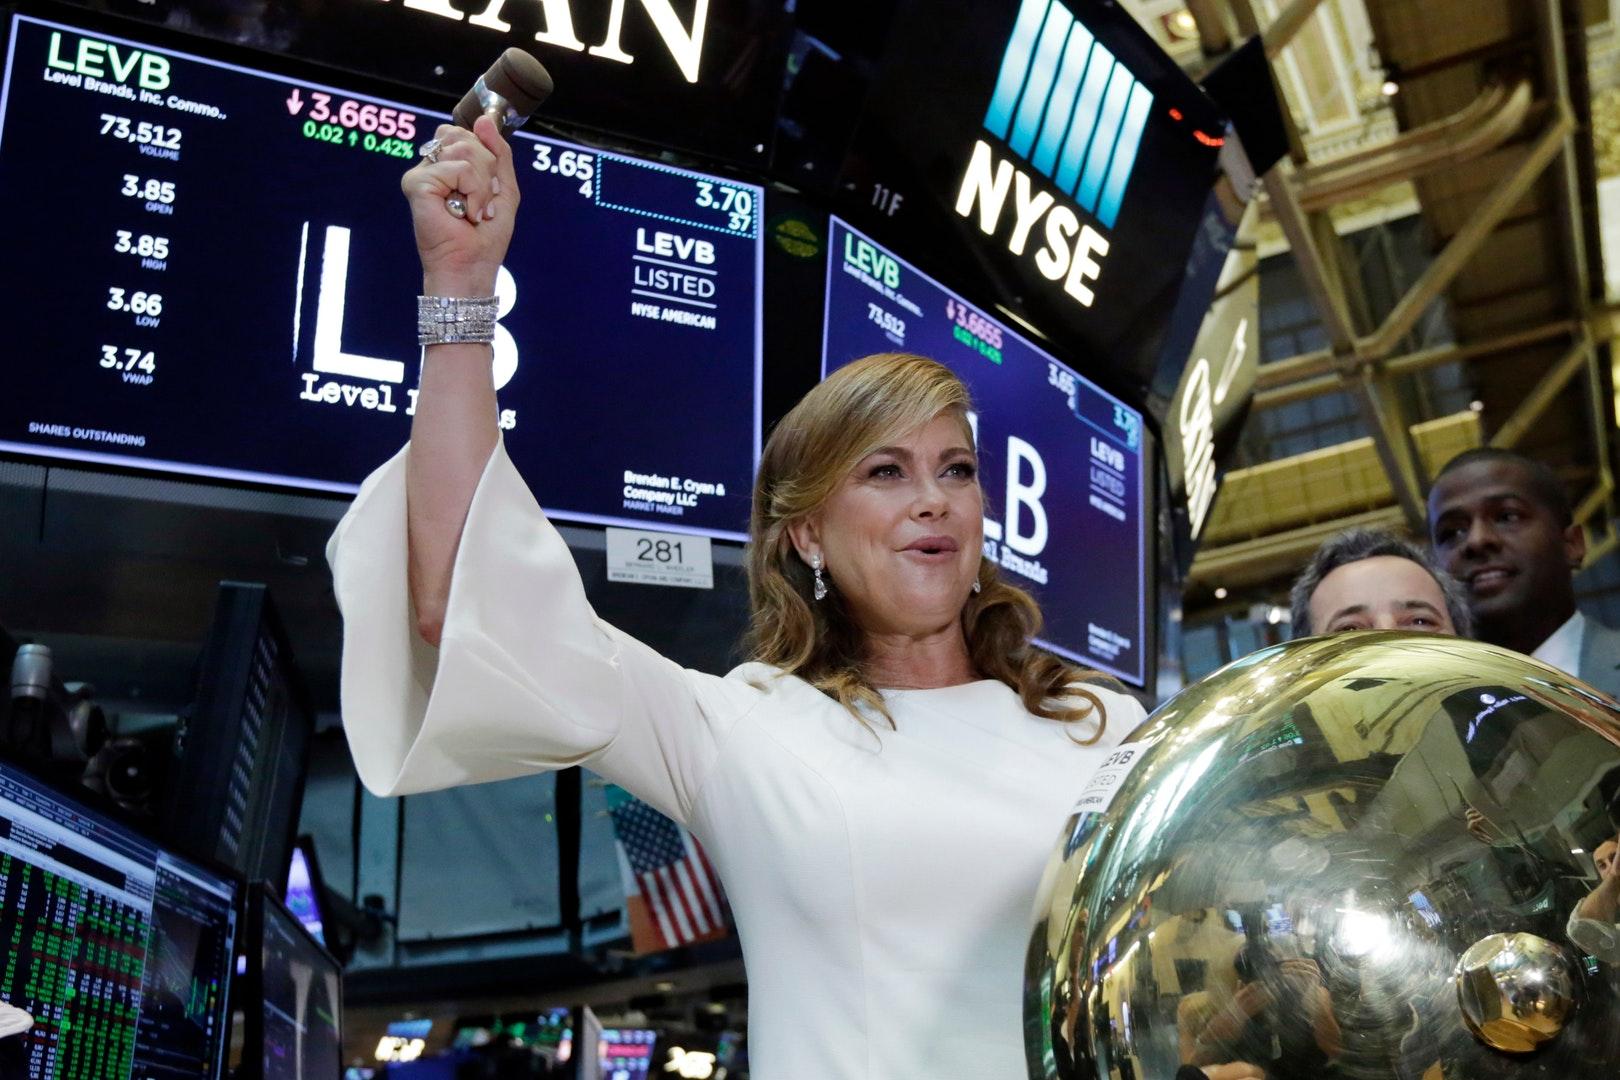 Kathy Ireland Talks Her Brand's Step Into CBD